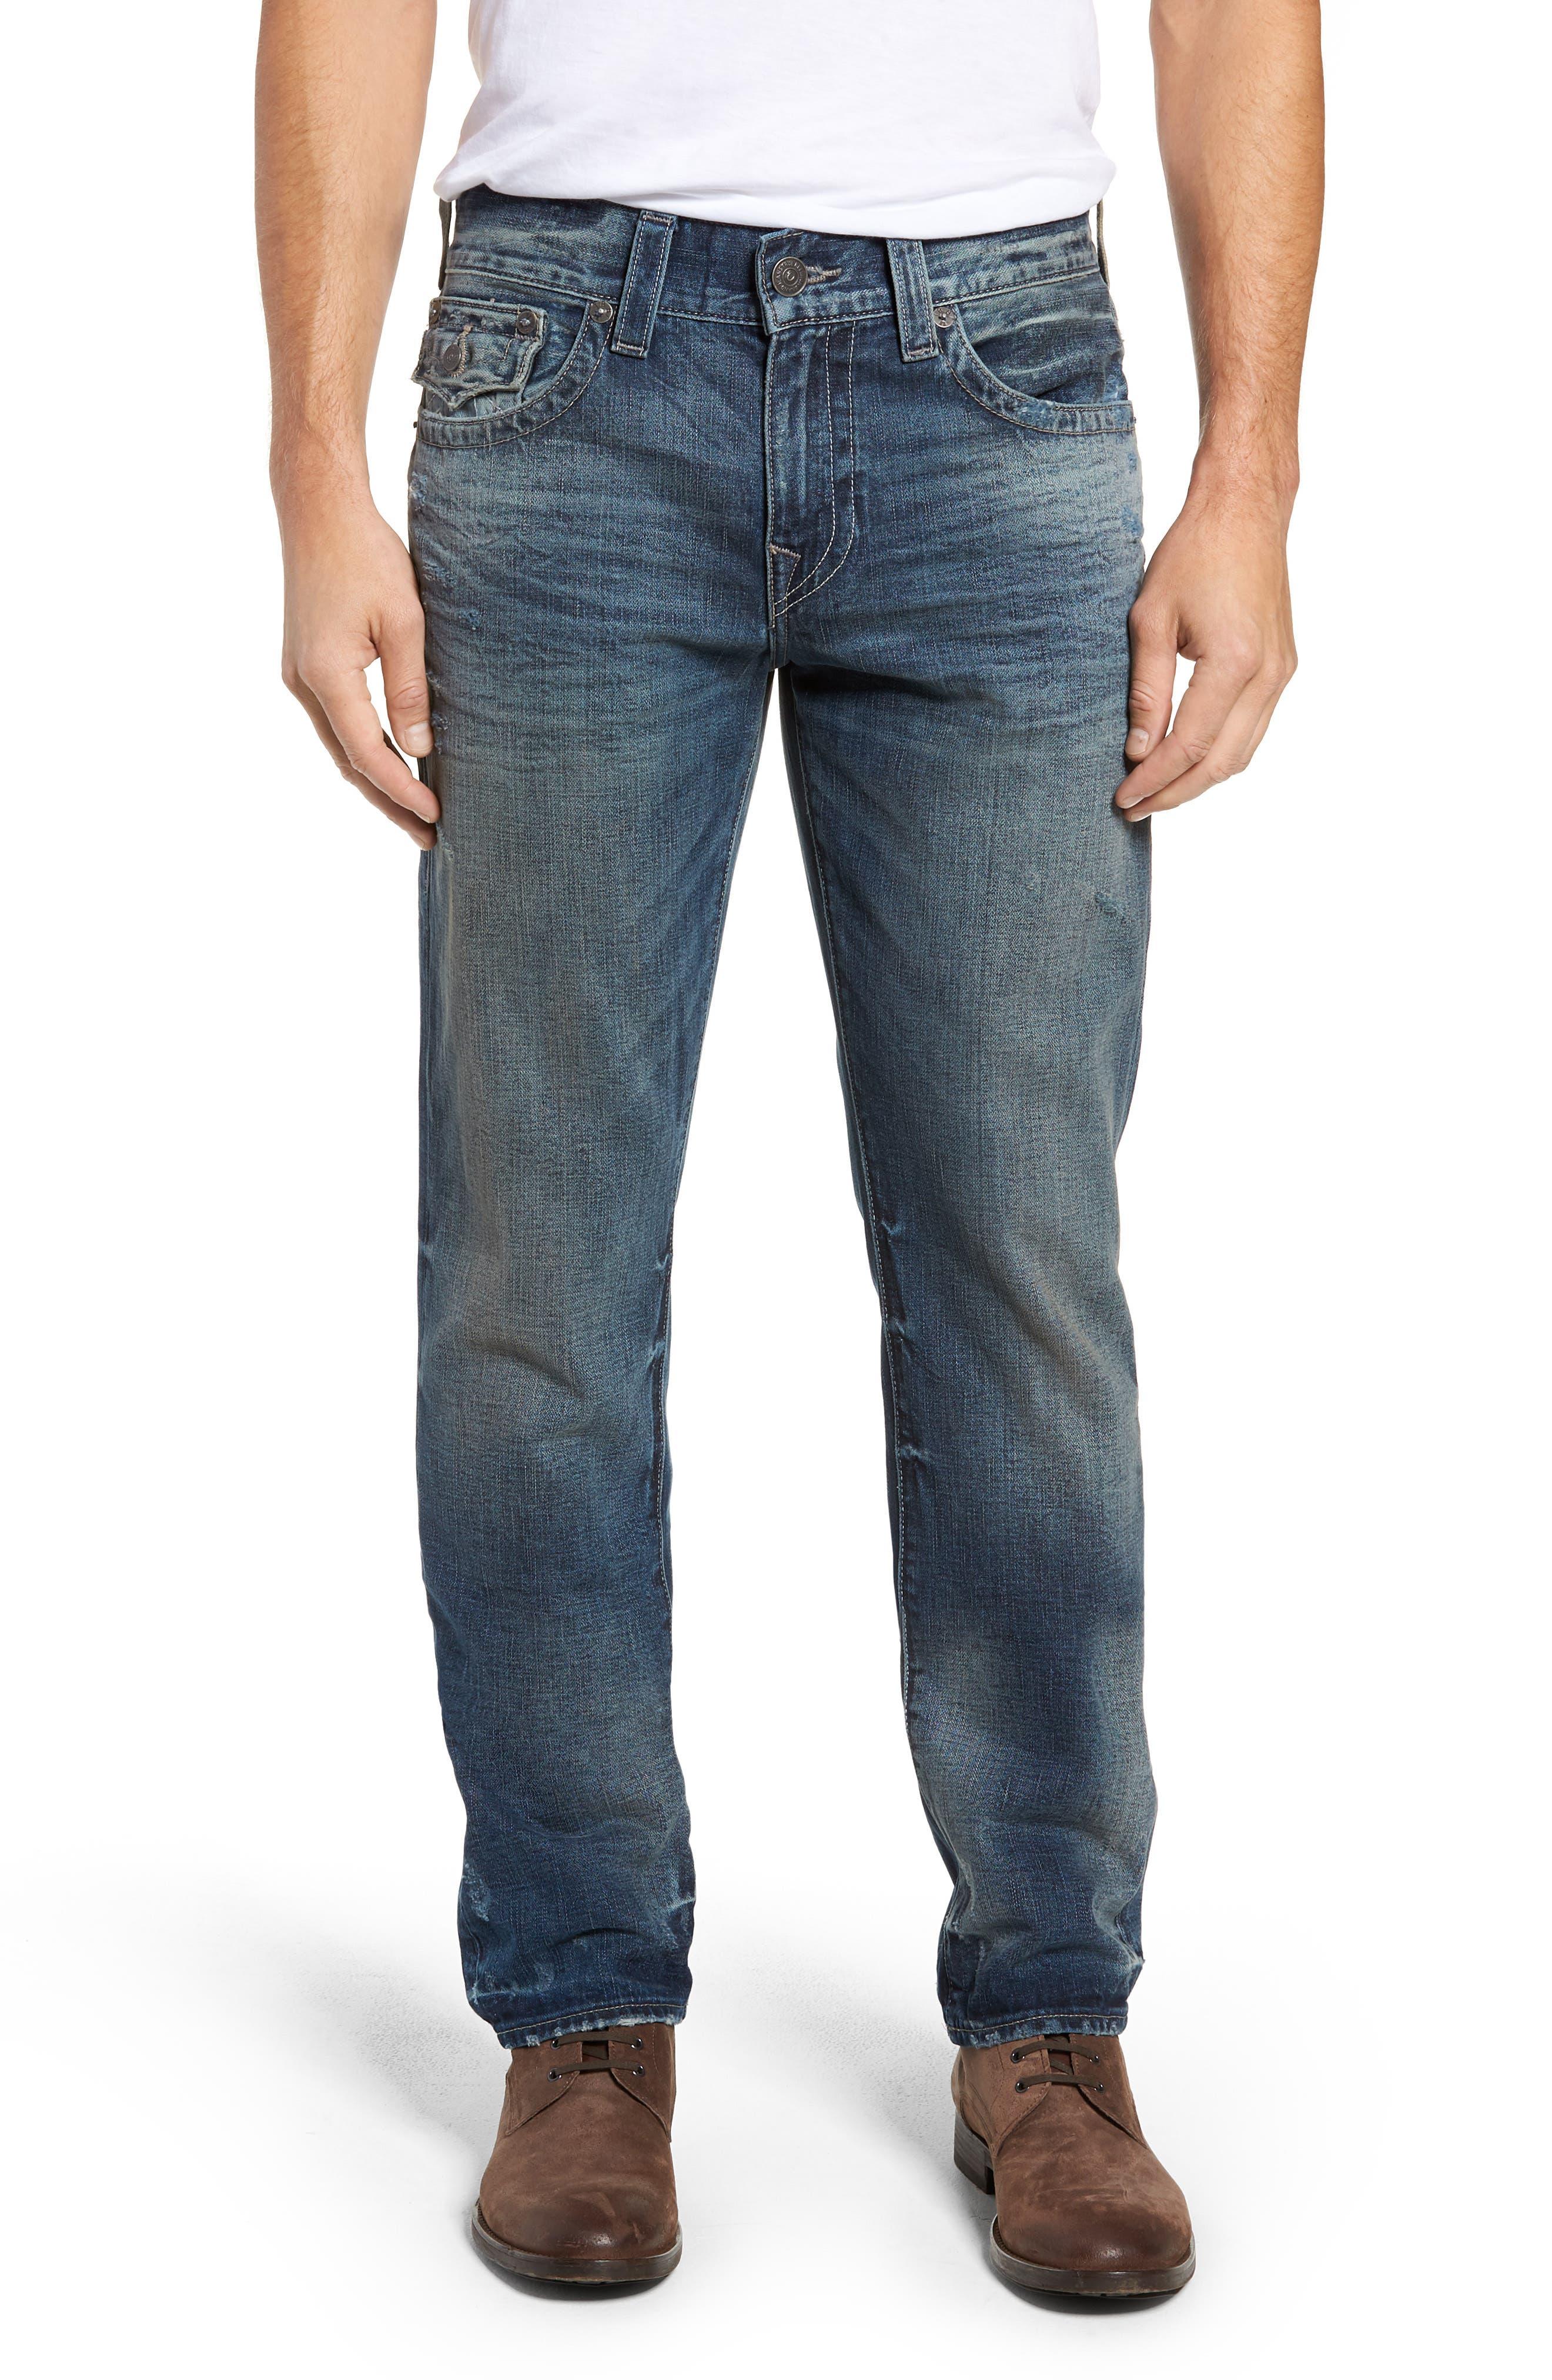 Geno Straight Leg Jeans,                             Main thumbnail 1, color,                             COMBAT BLUE